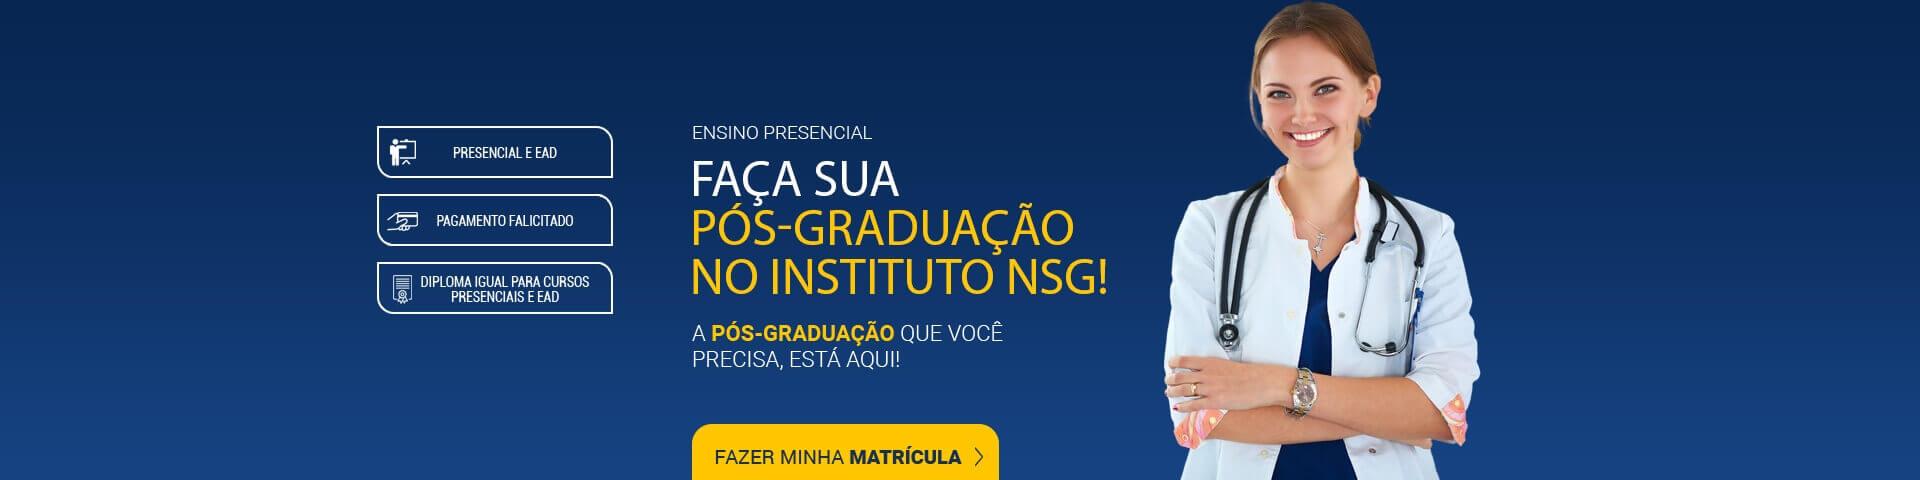 Banner Principal - INSG